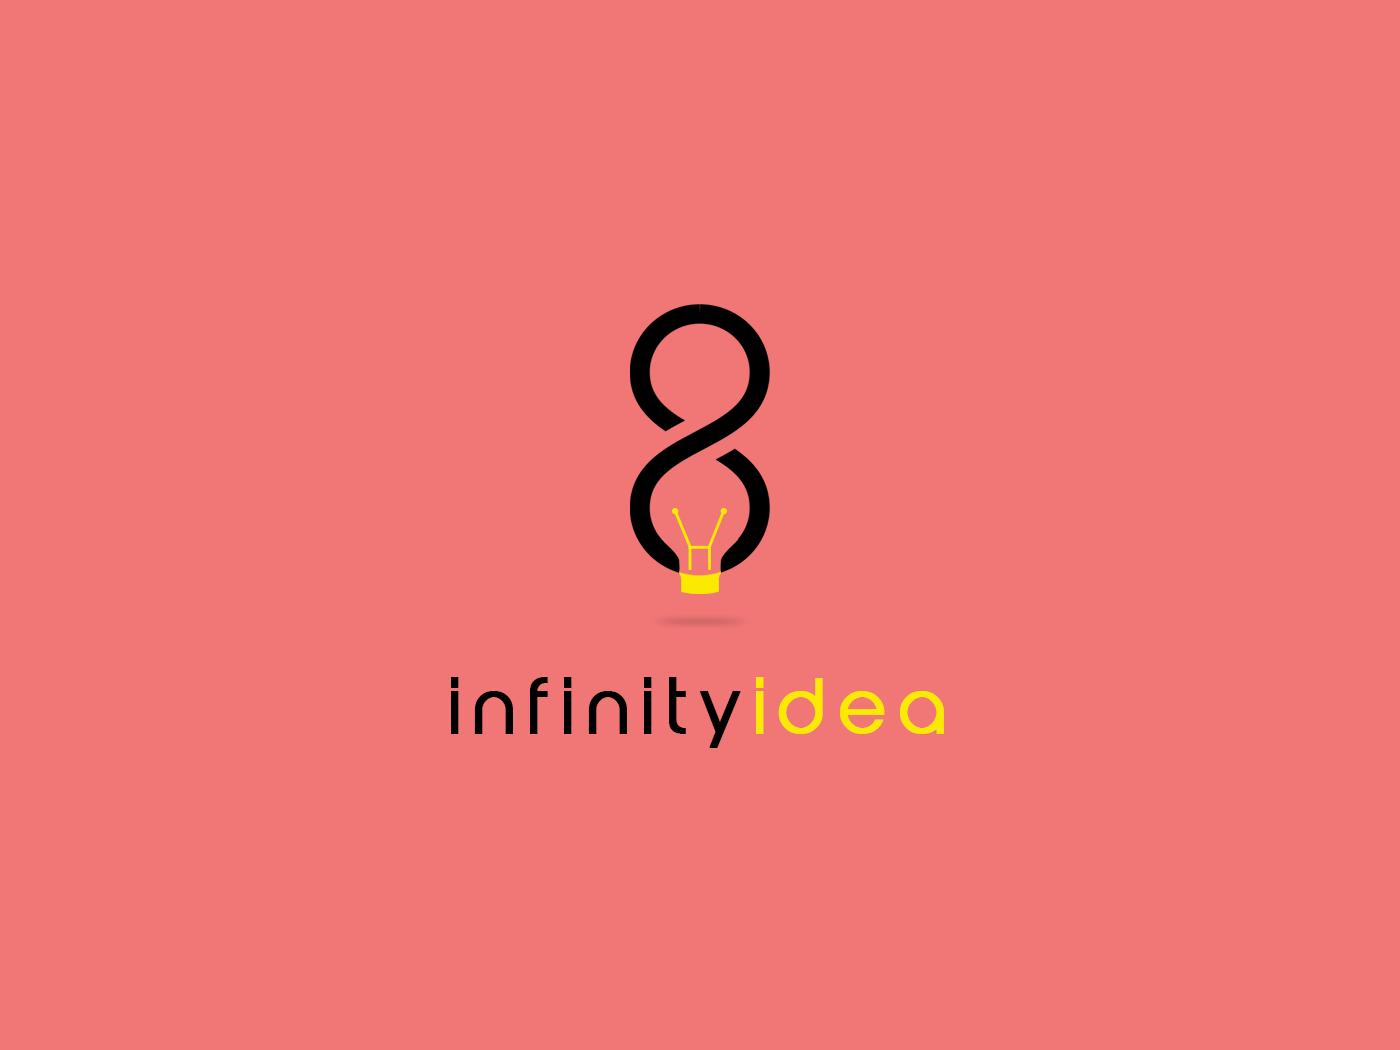 Creative Designs Idea Free | Creative Ideas For Designers for logo design ideas for graphic designers png  146hul